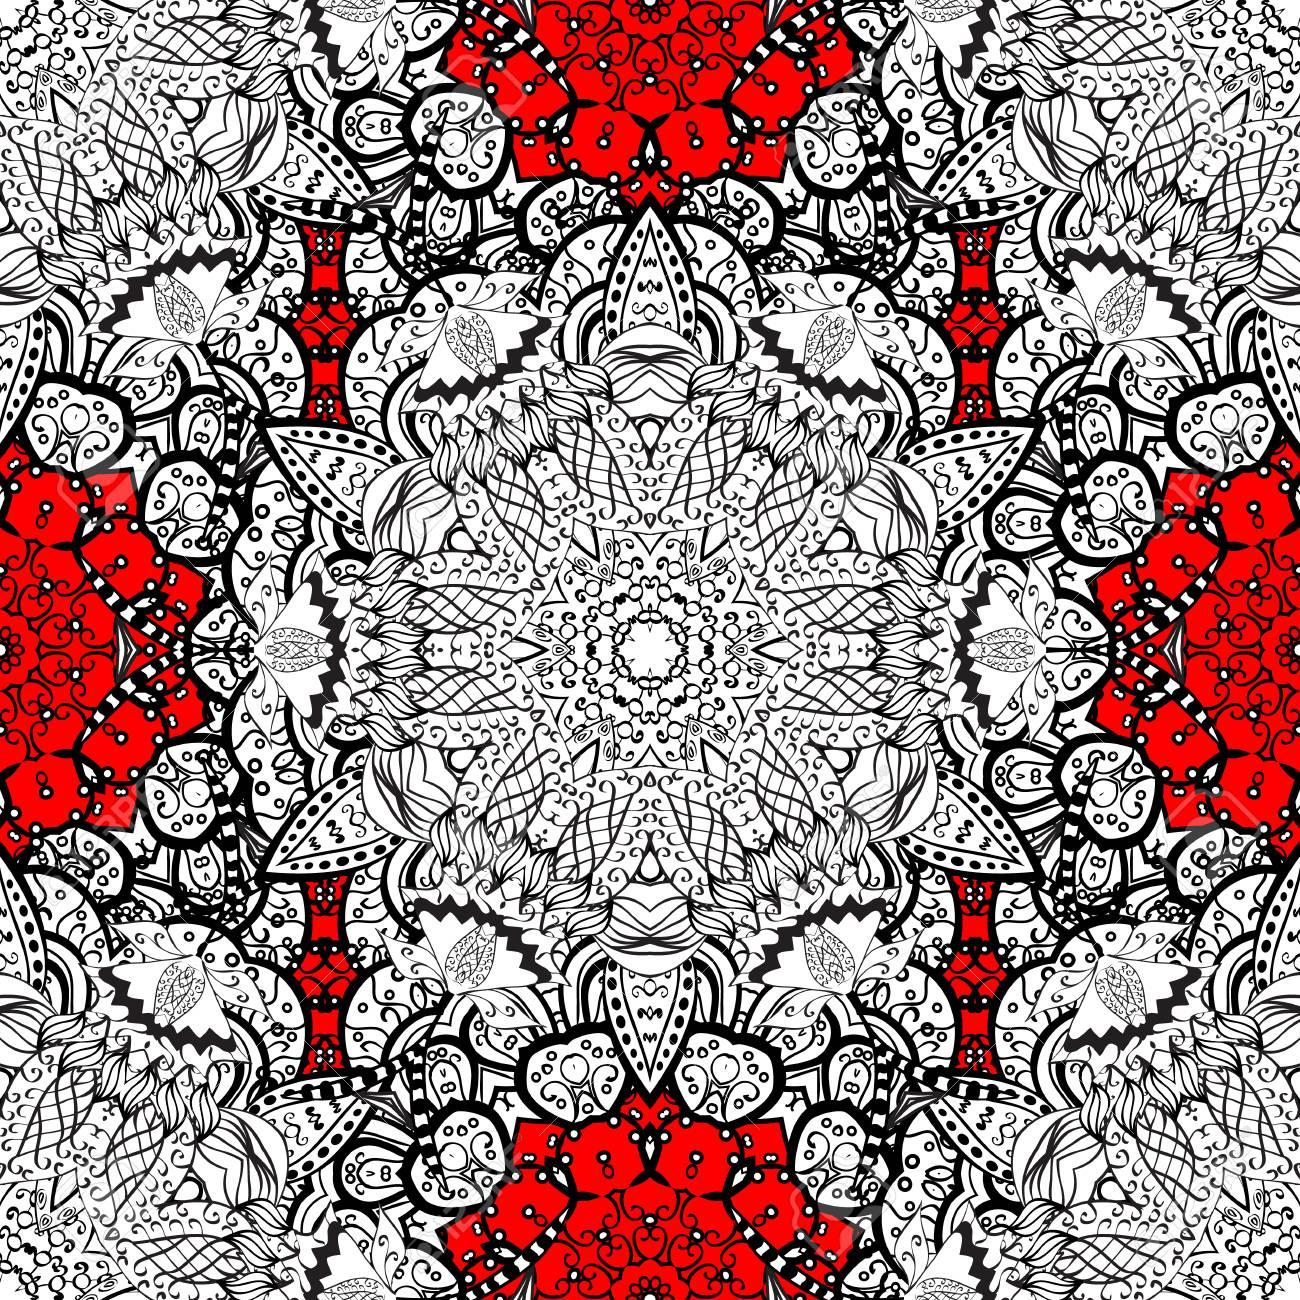 Seamless medieval floral royal pattern decorative symmetry seamless medieval floral royal pattern decorative symmetry arabesque gold on red background good stopboris Choice Image